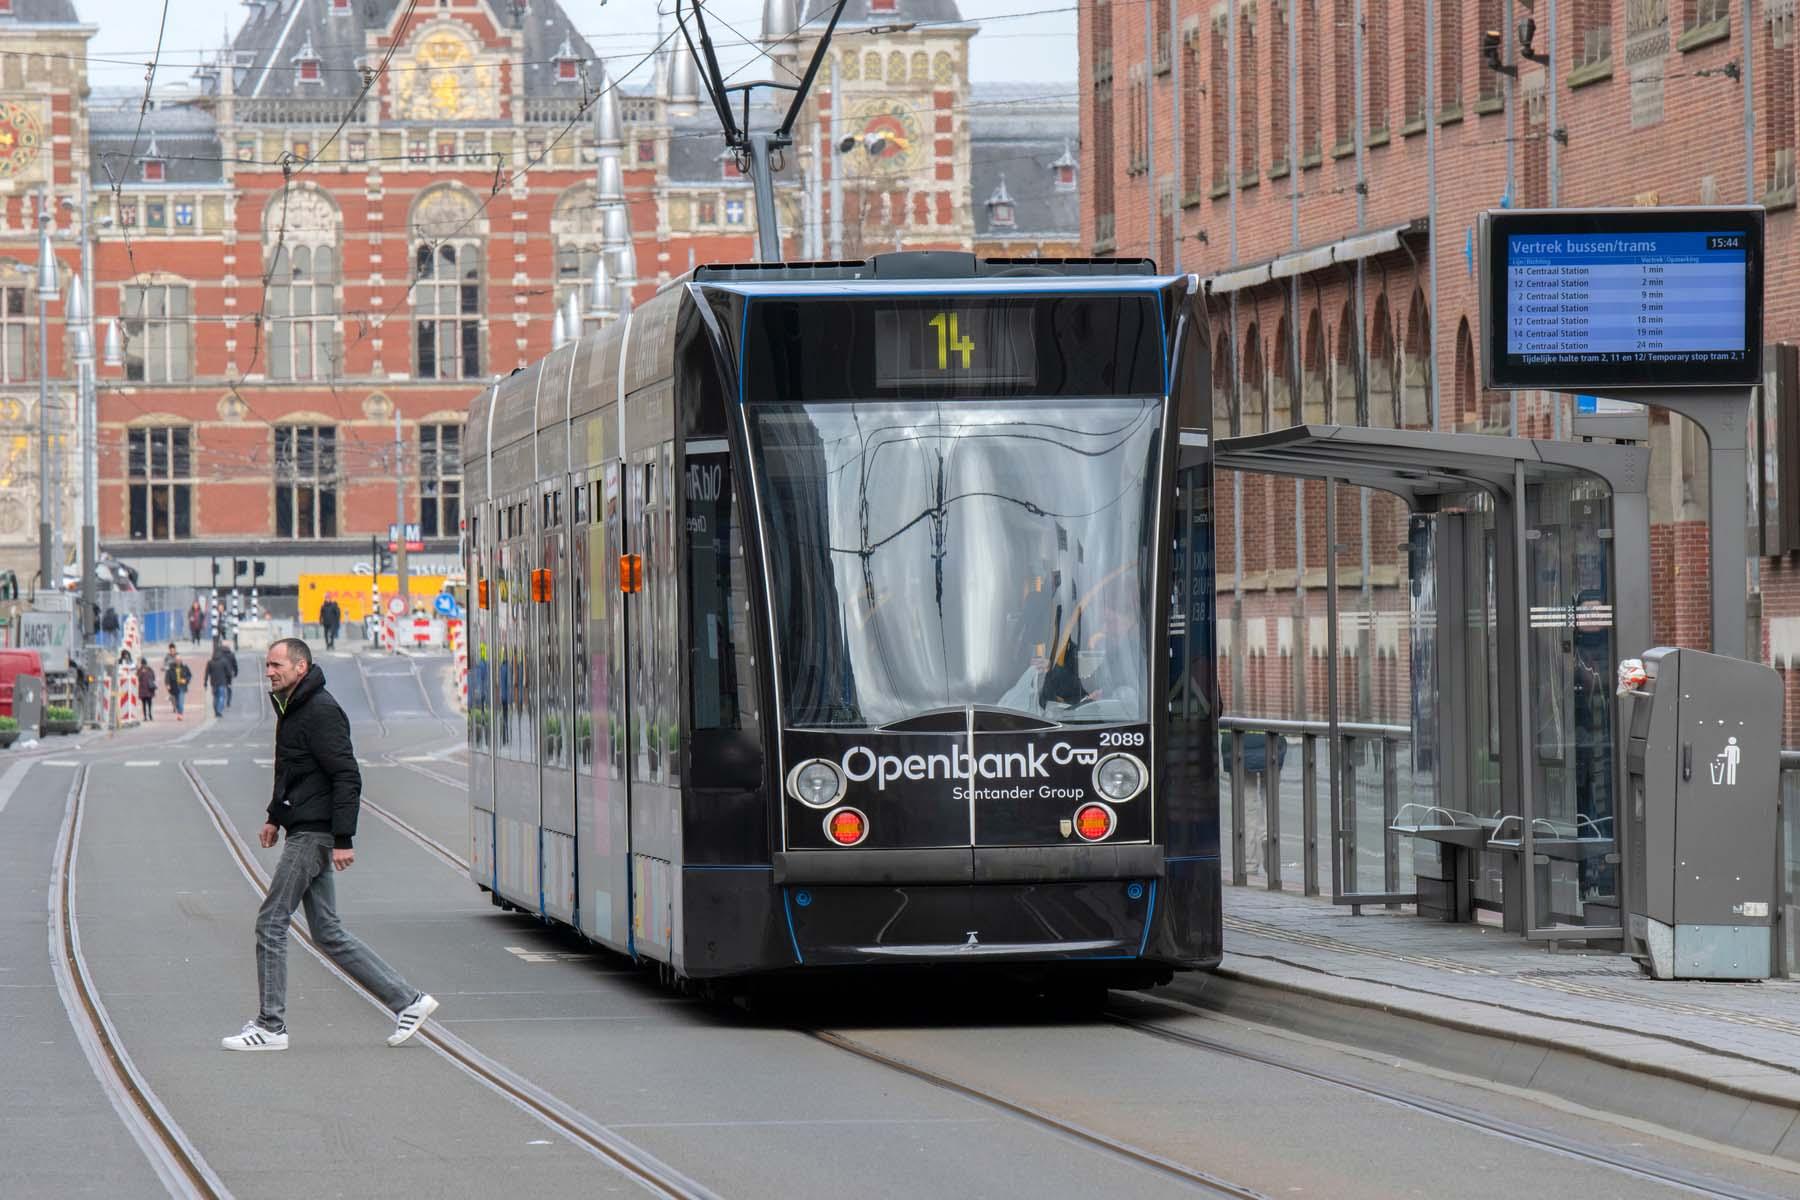 openbank tram in Amsterdam